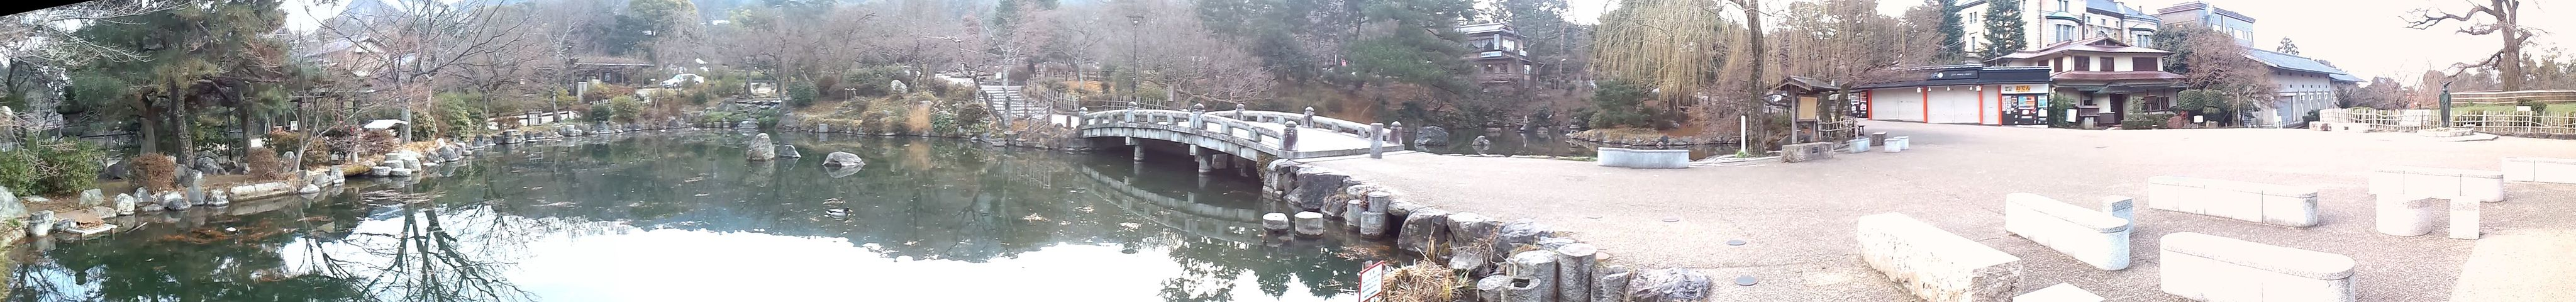 Maruyama-kôen Park - Panorama